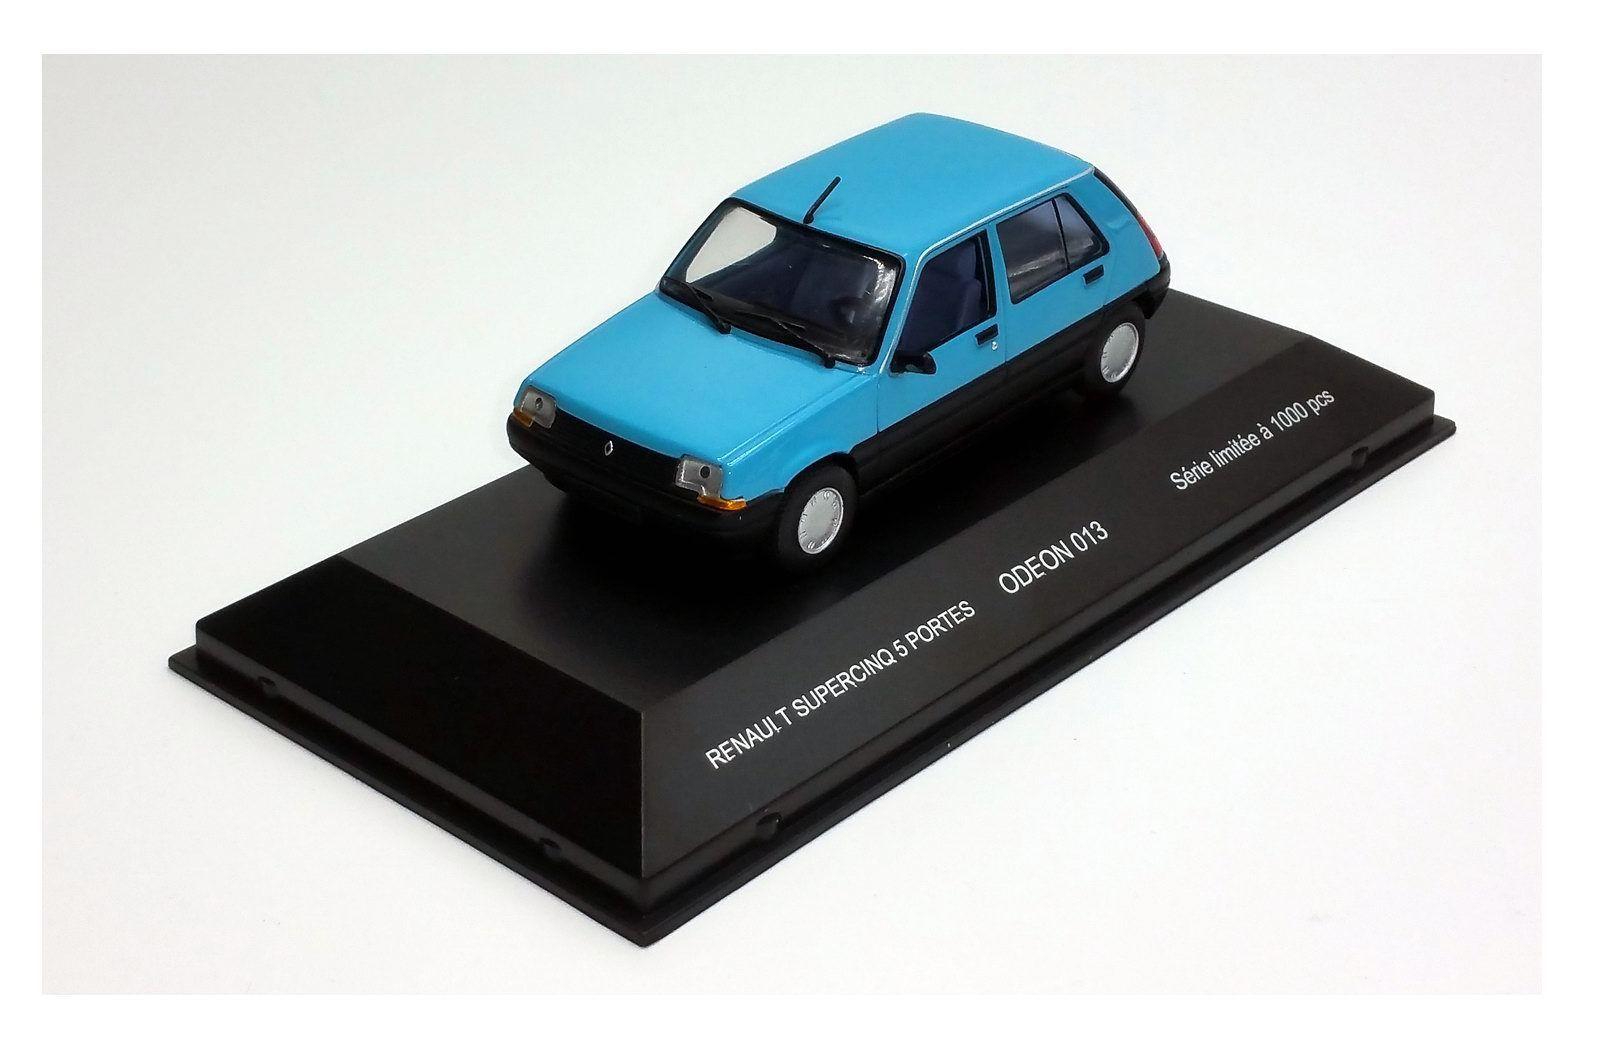 Car RENAULT SUPER 5 GTL 1985 ODEON 1 43 Edition Limited 1000 PCS Renault 5